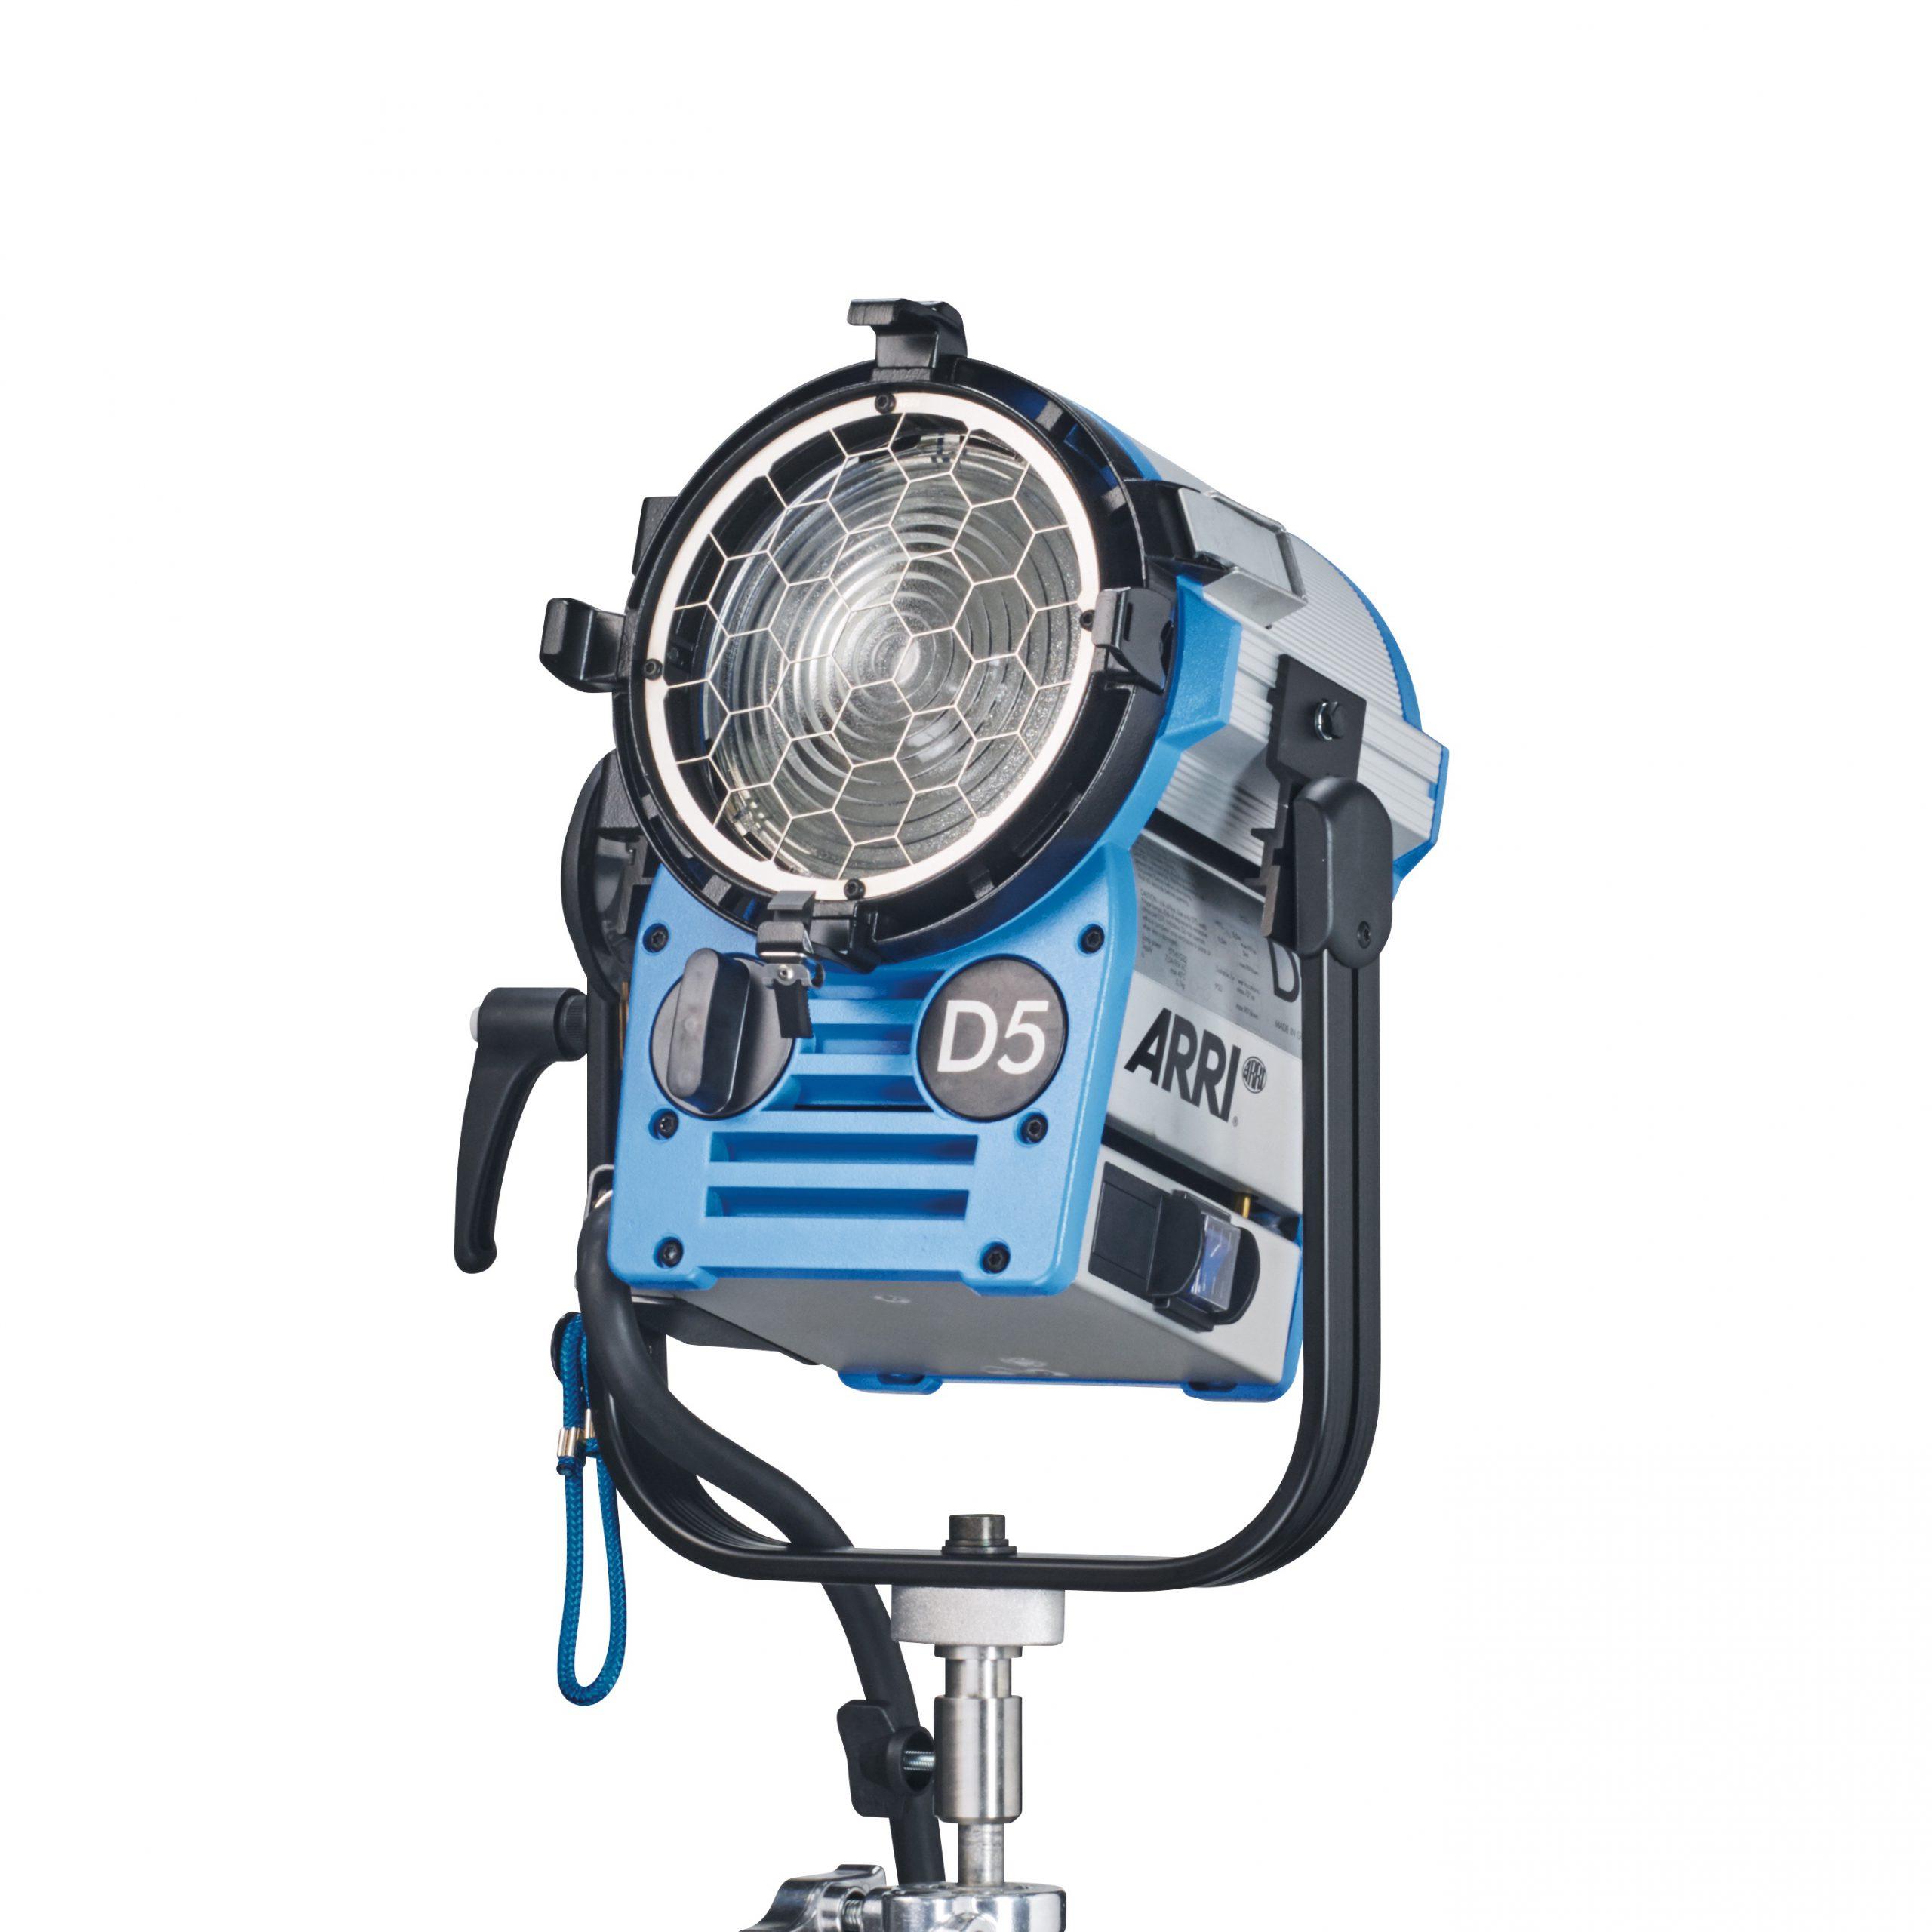 ARRI True Blue D5 MAN, VEAM, blue silver